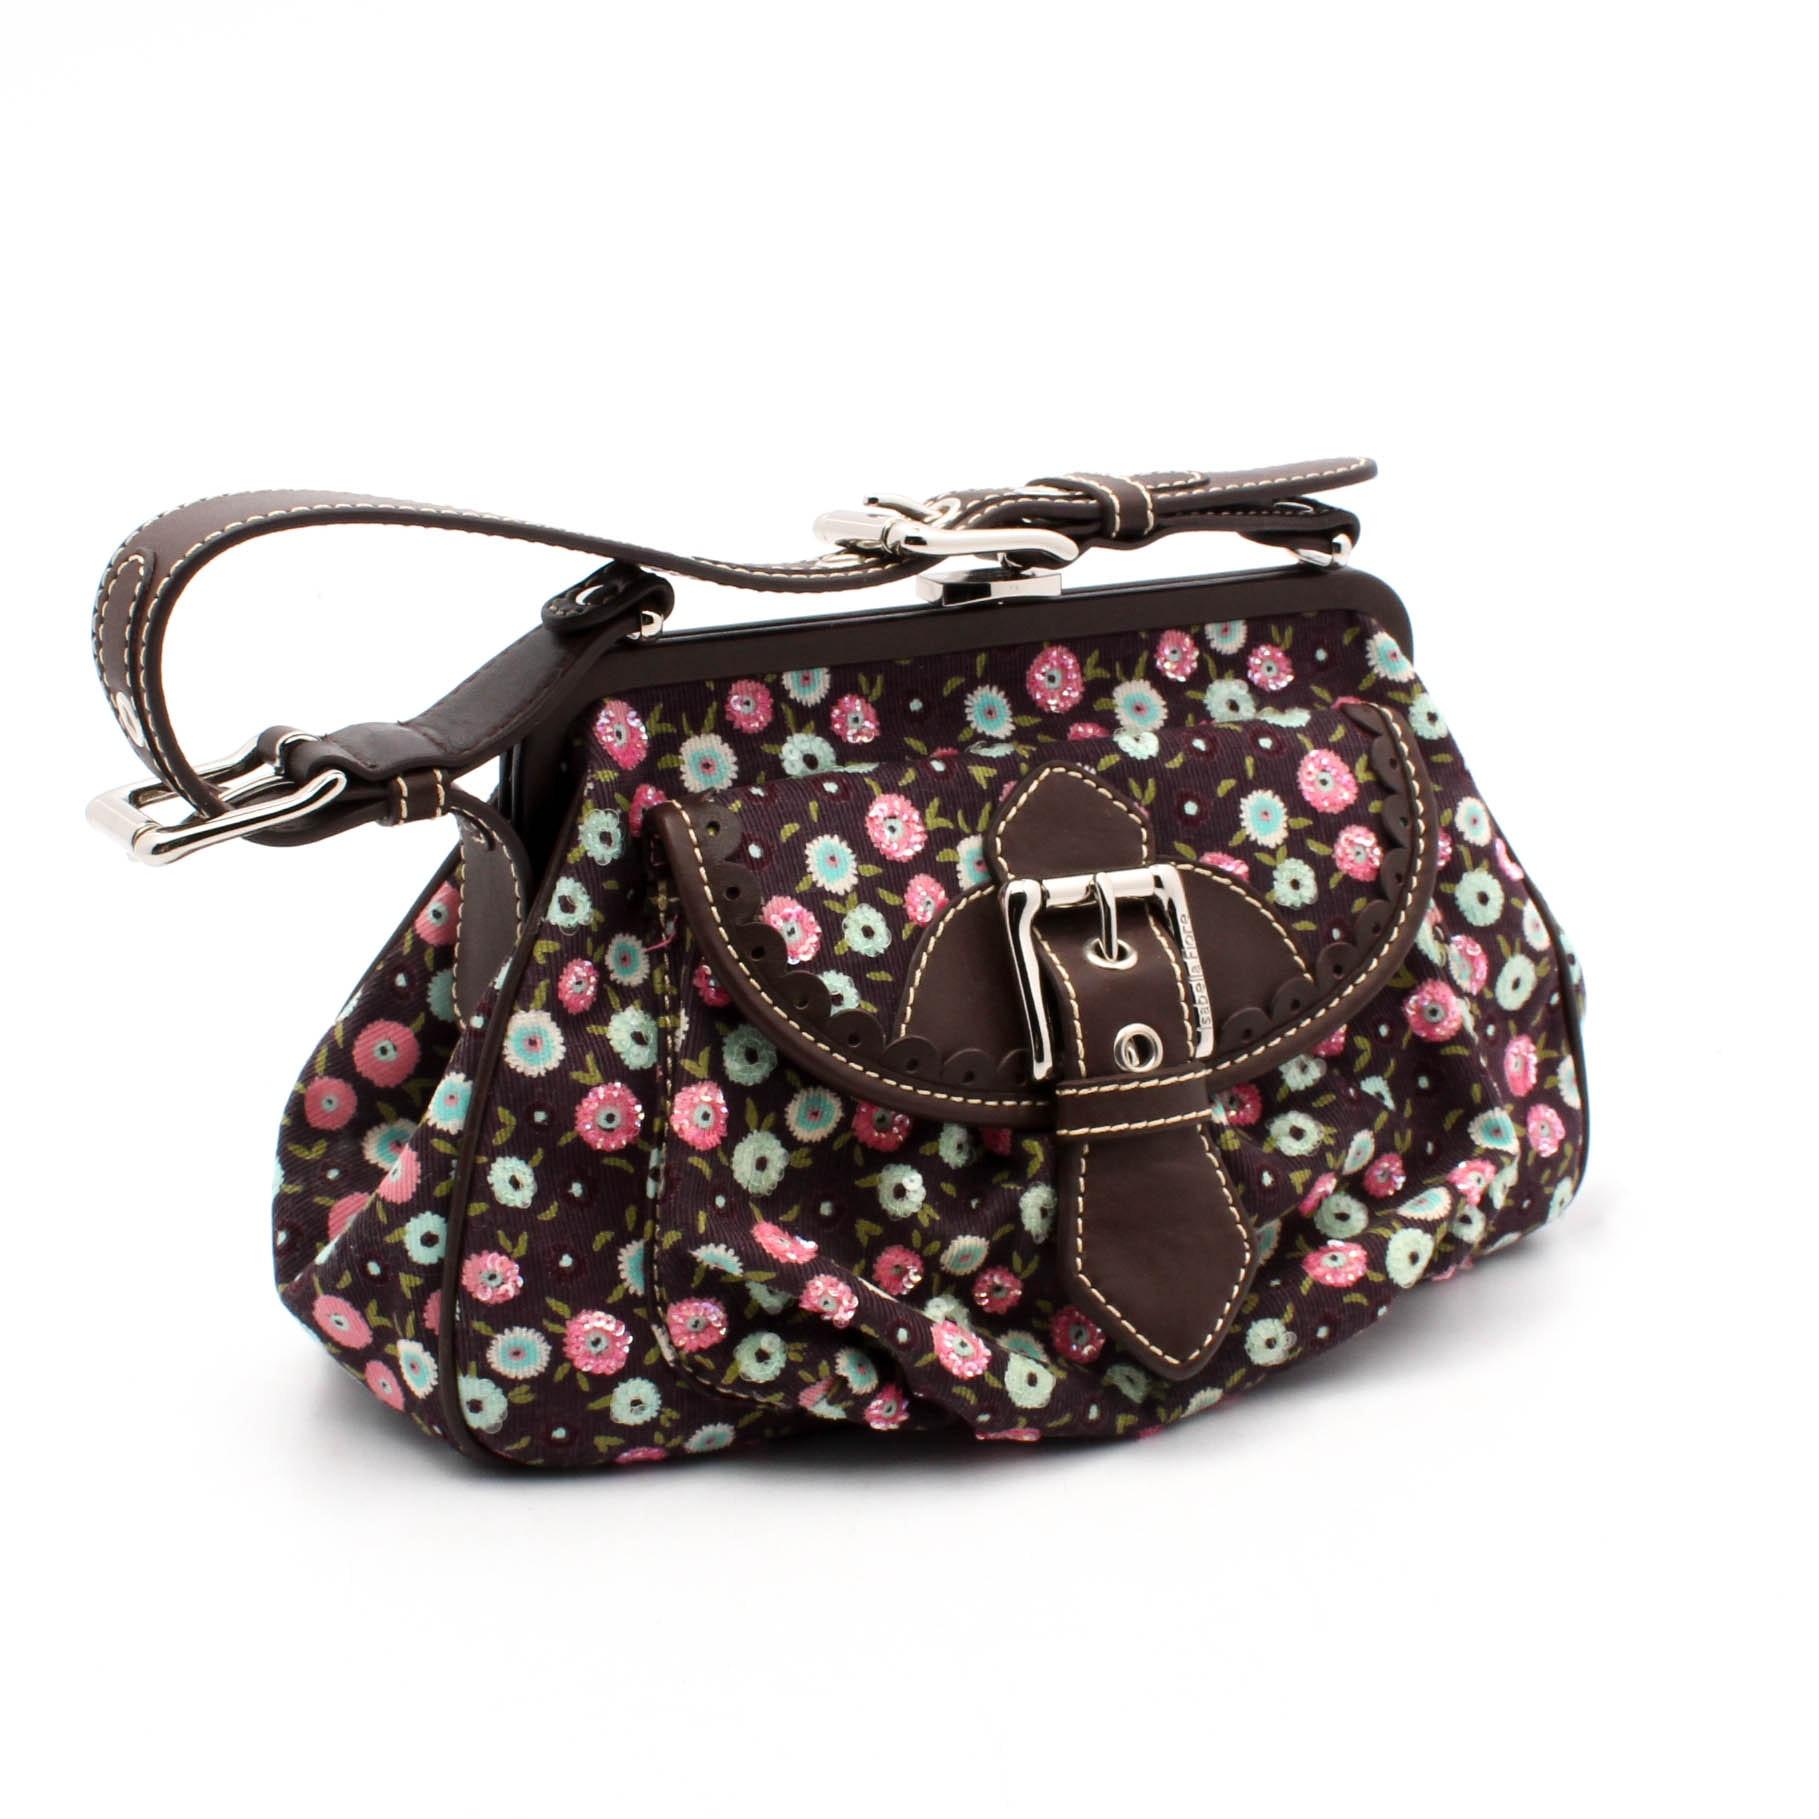 Isabella Fiore Floral Corduroy Frame and Brown Leather Shoulder Bag